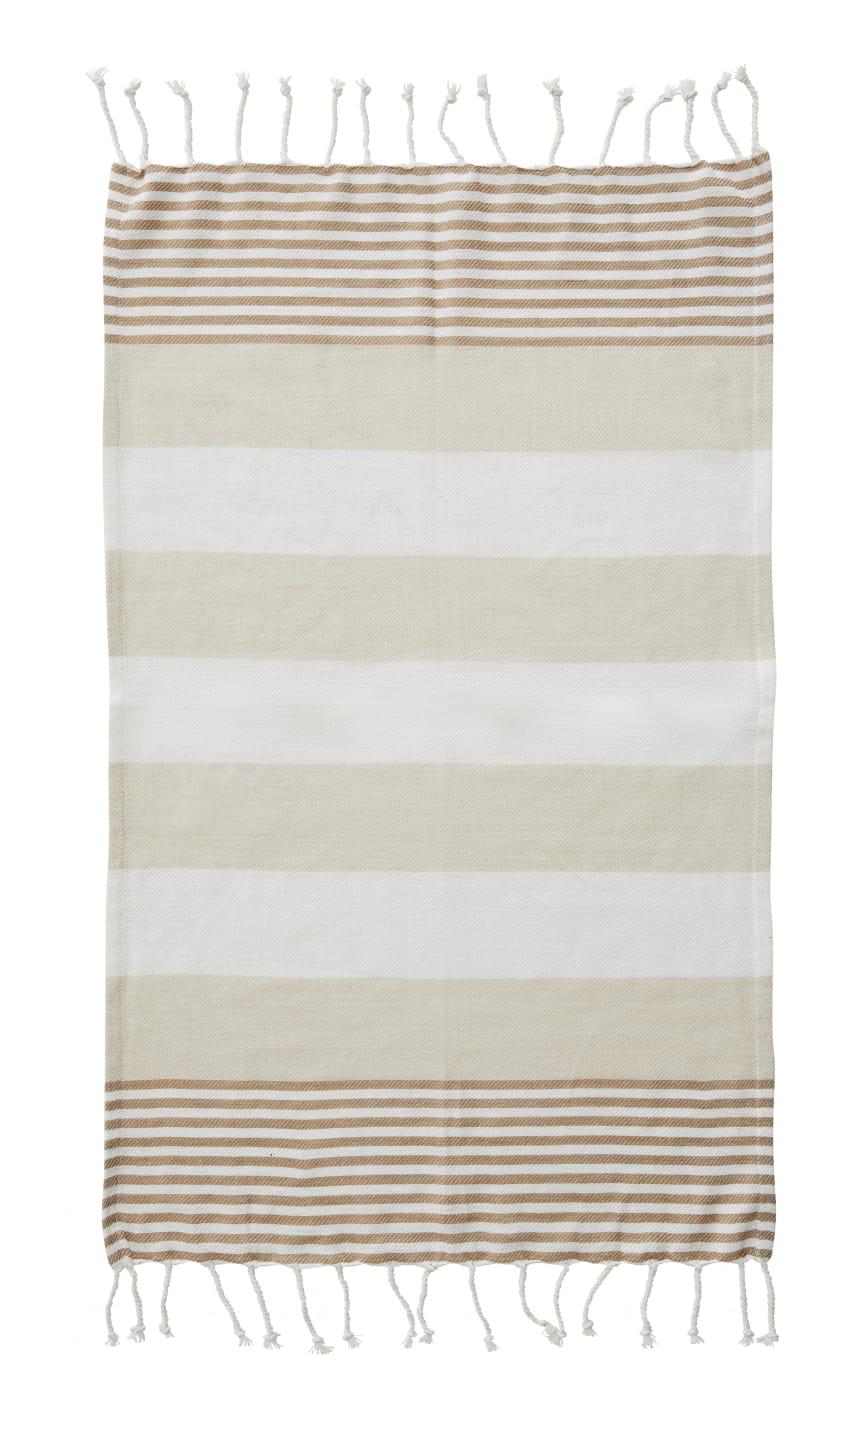 Hamam handduk ECO 90 x 170 cm, beige